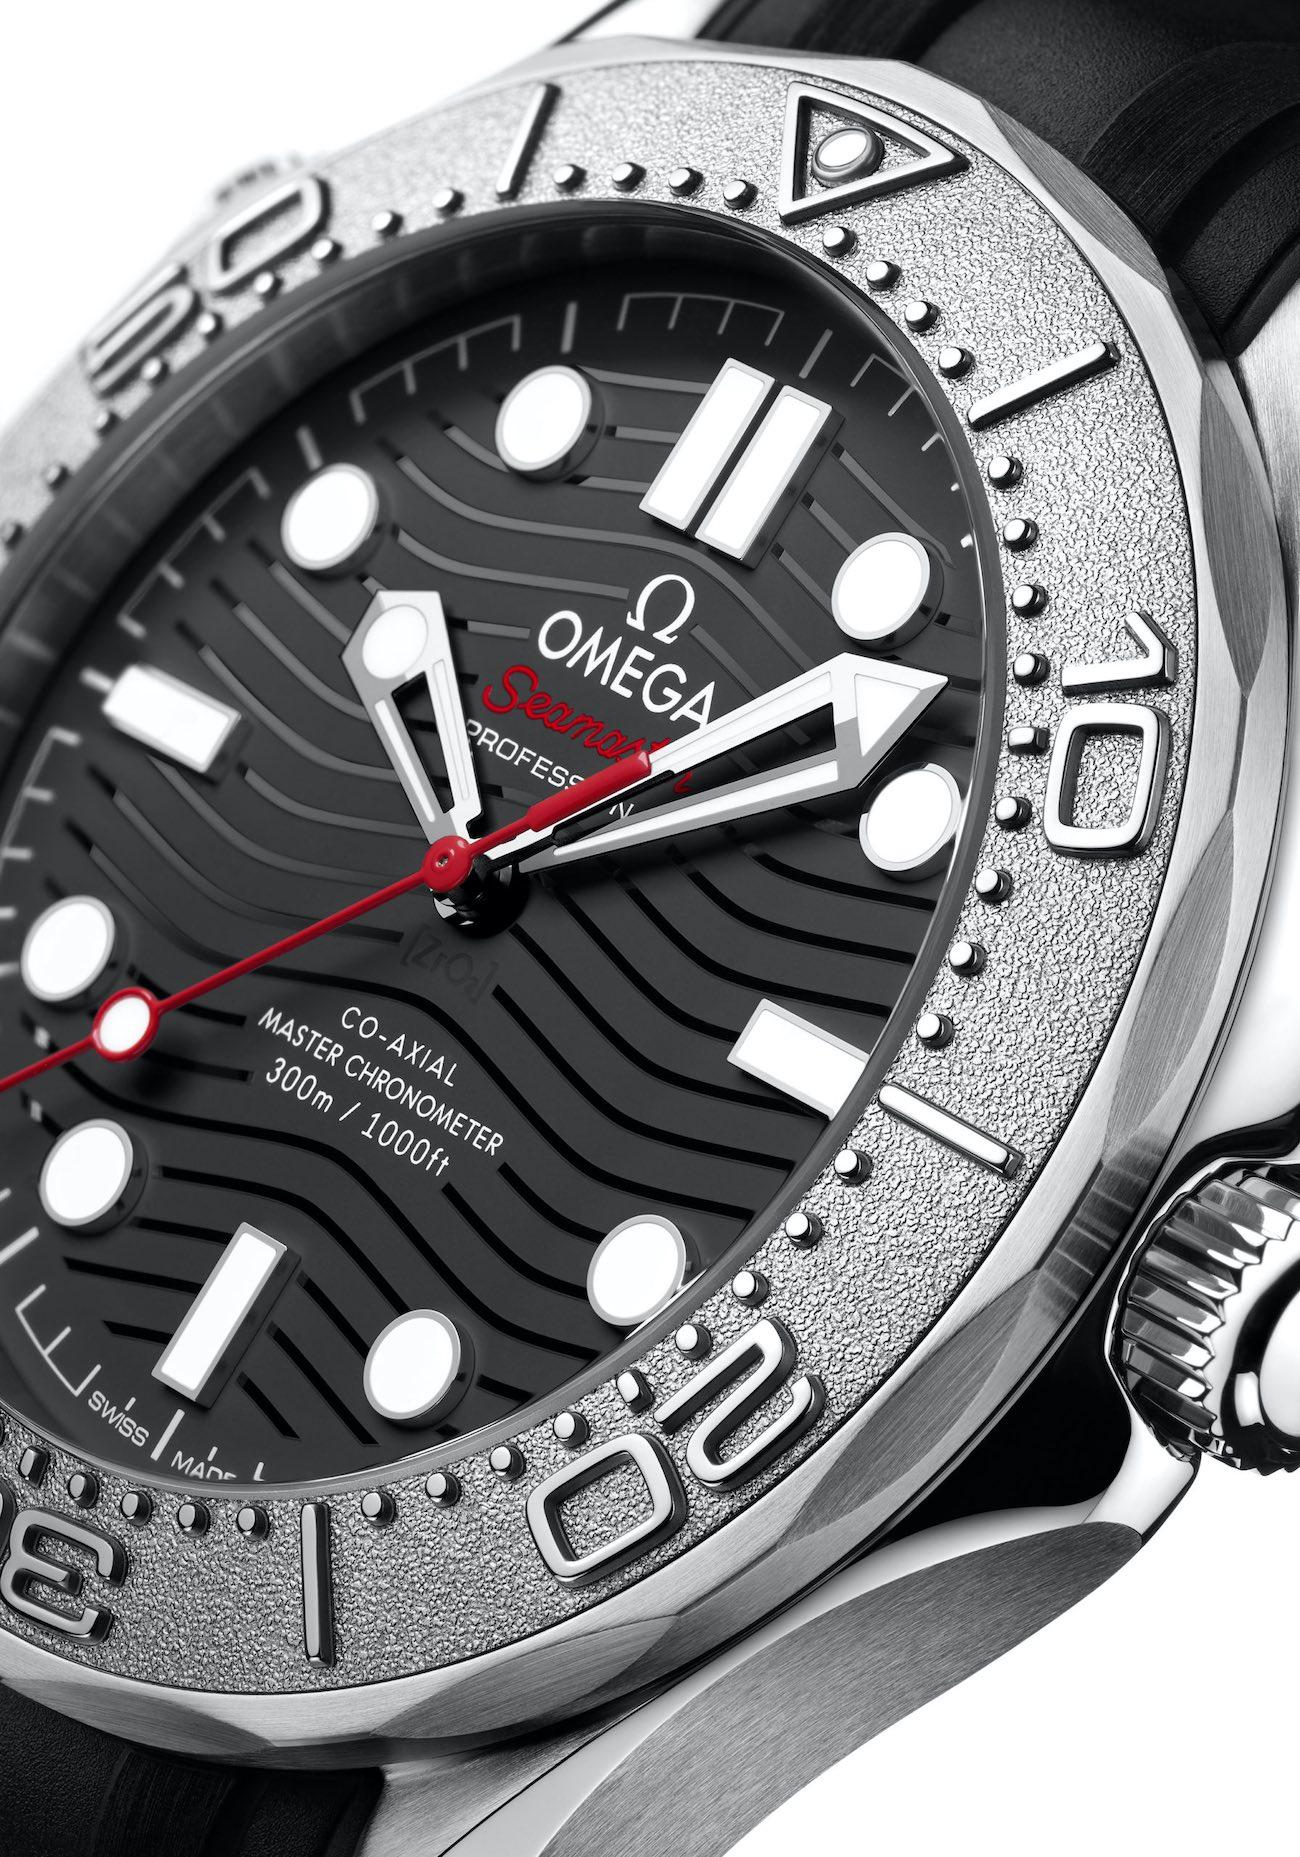 Omega Seamaster Diver 300M Nekton Edition 210-32-42-20-01-002 - 3